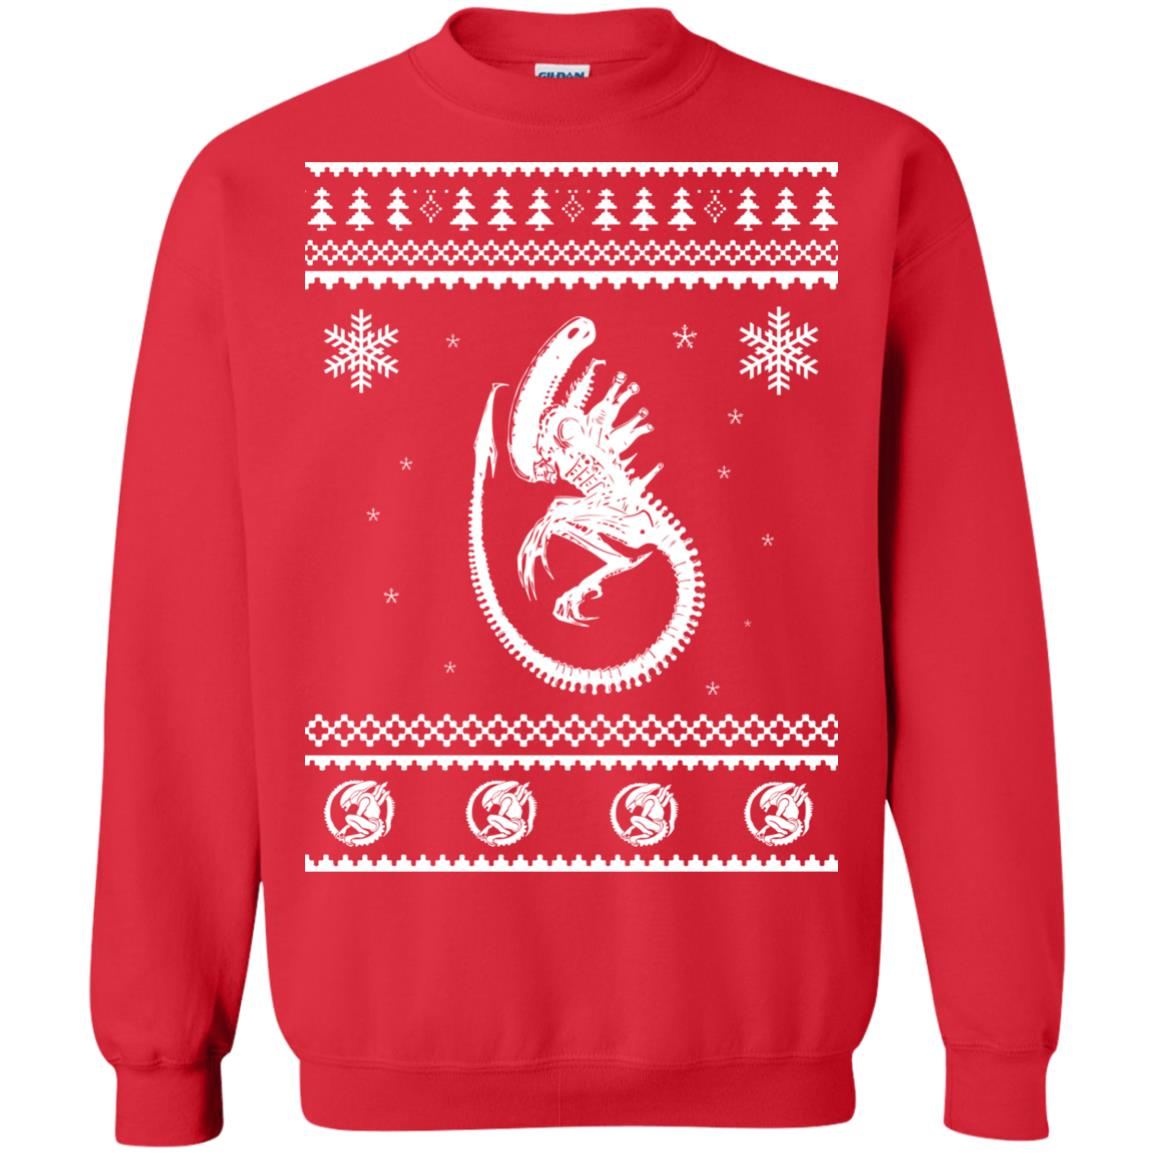 image 2849 - Xeno-mas - Aliens Xenomorph Christmas Sweater, Shirt, Hoodie